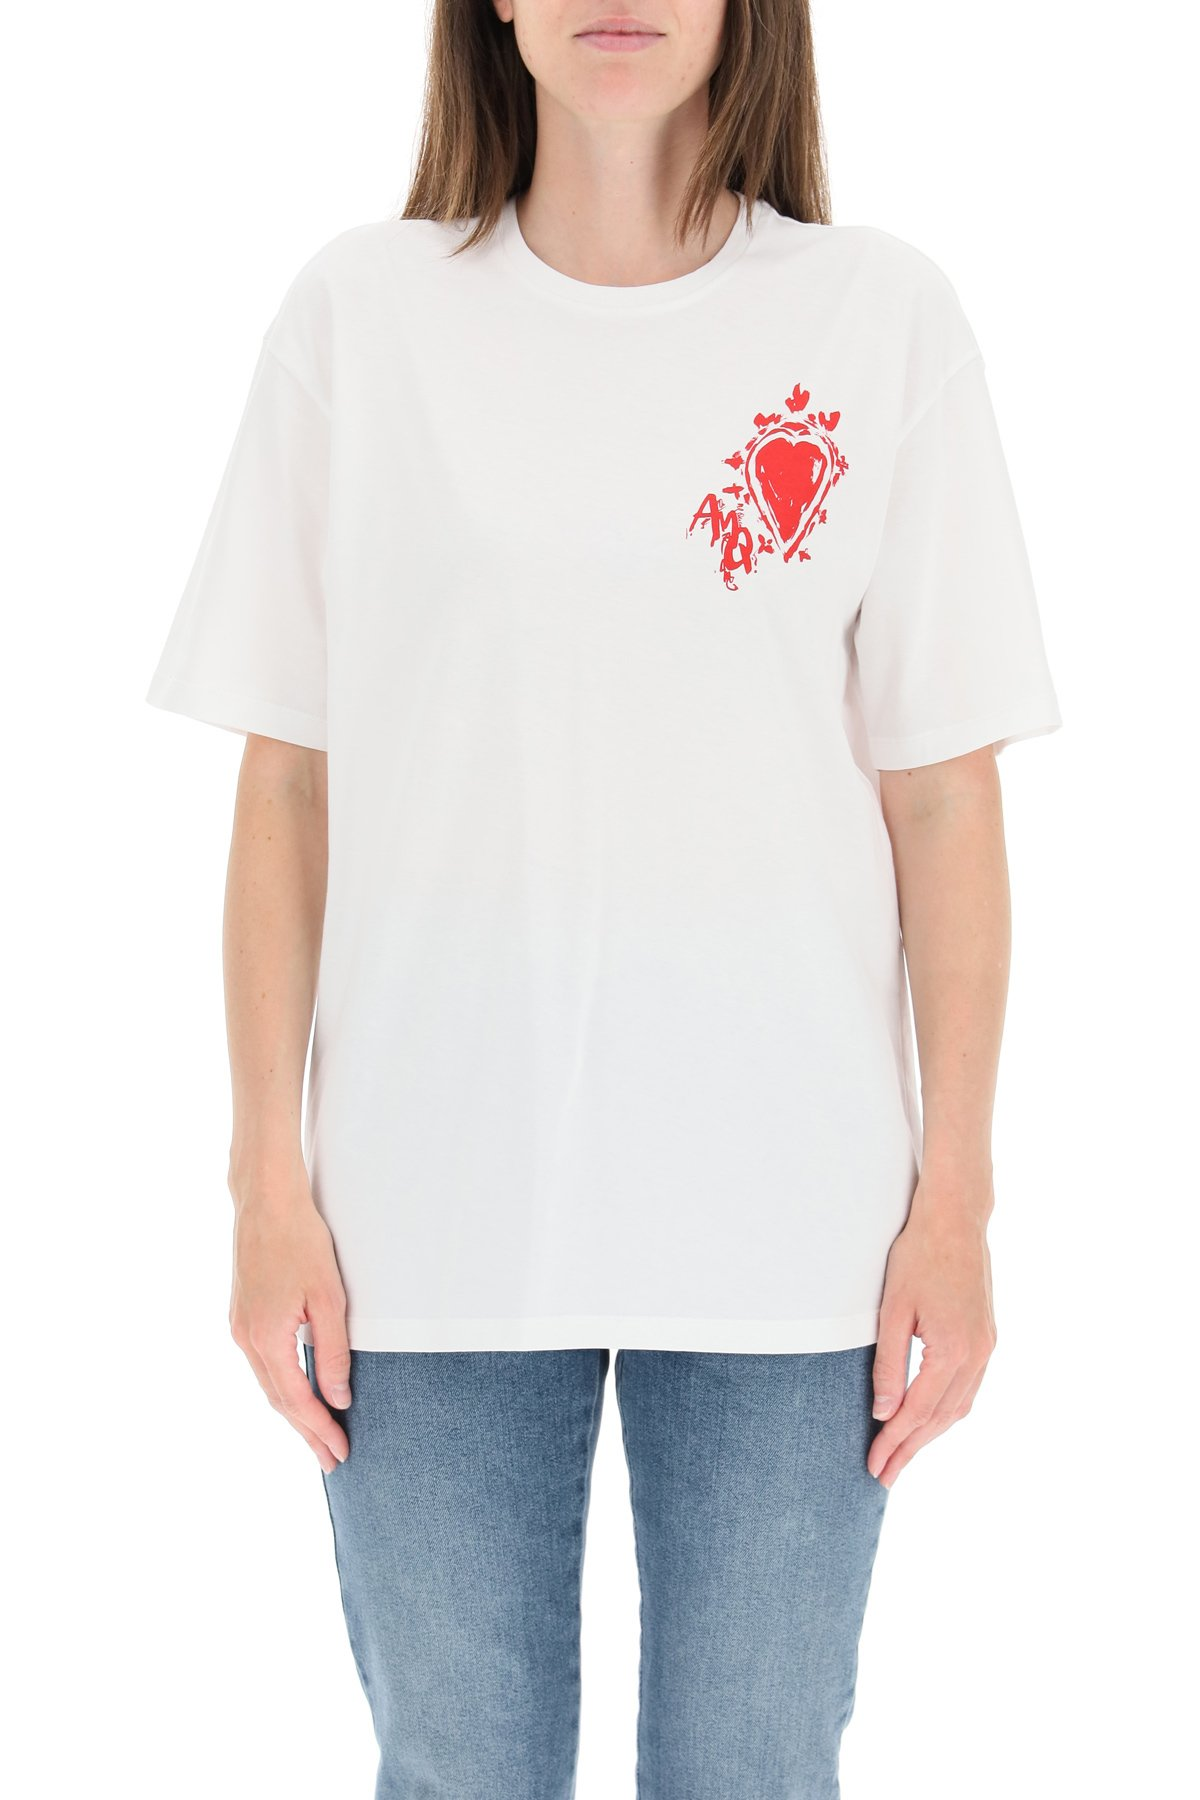 Alexander mcqueen t-shirt stampa love